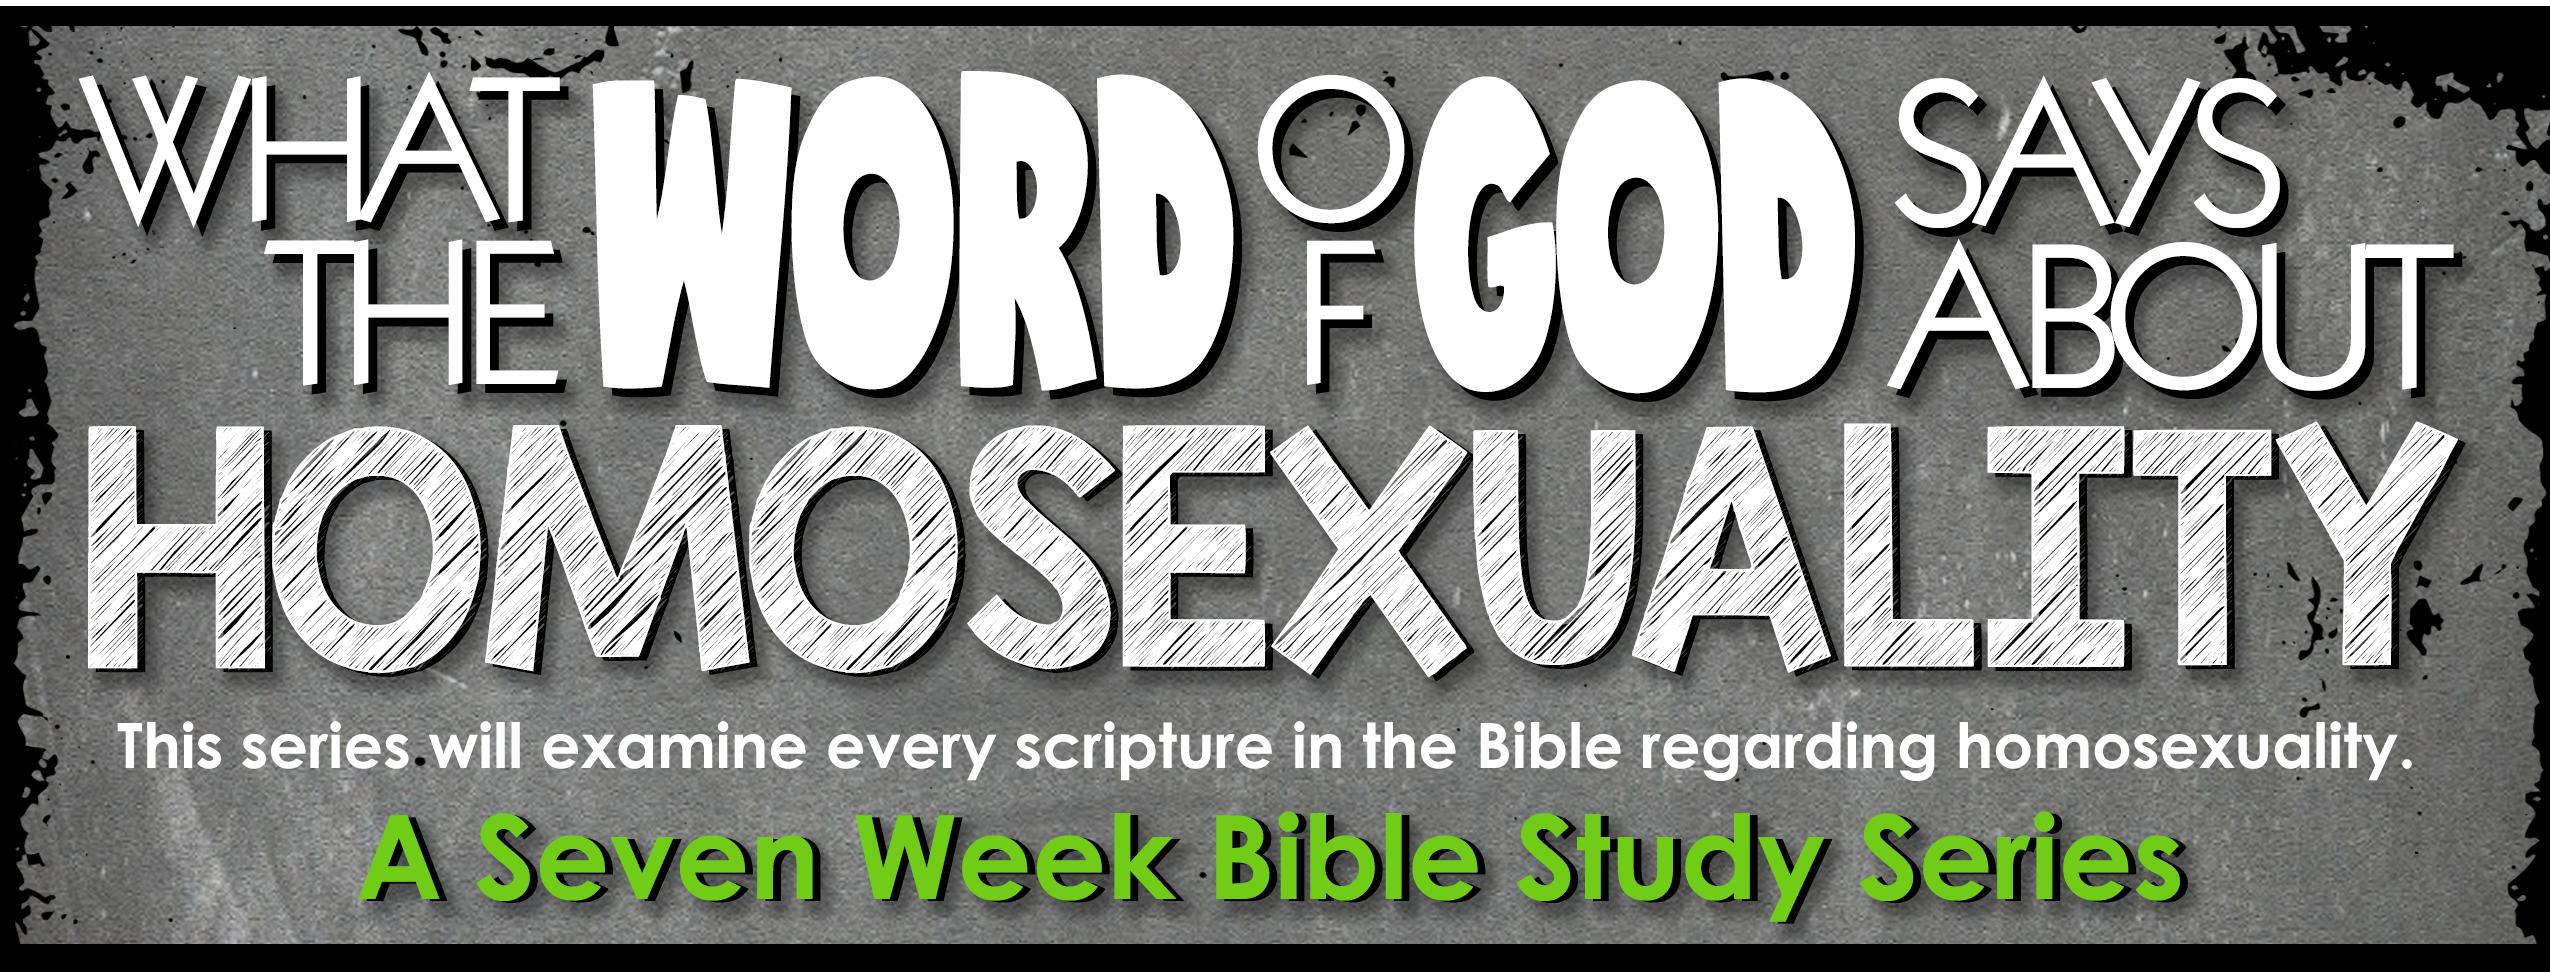 biblestudyseries